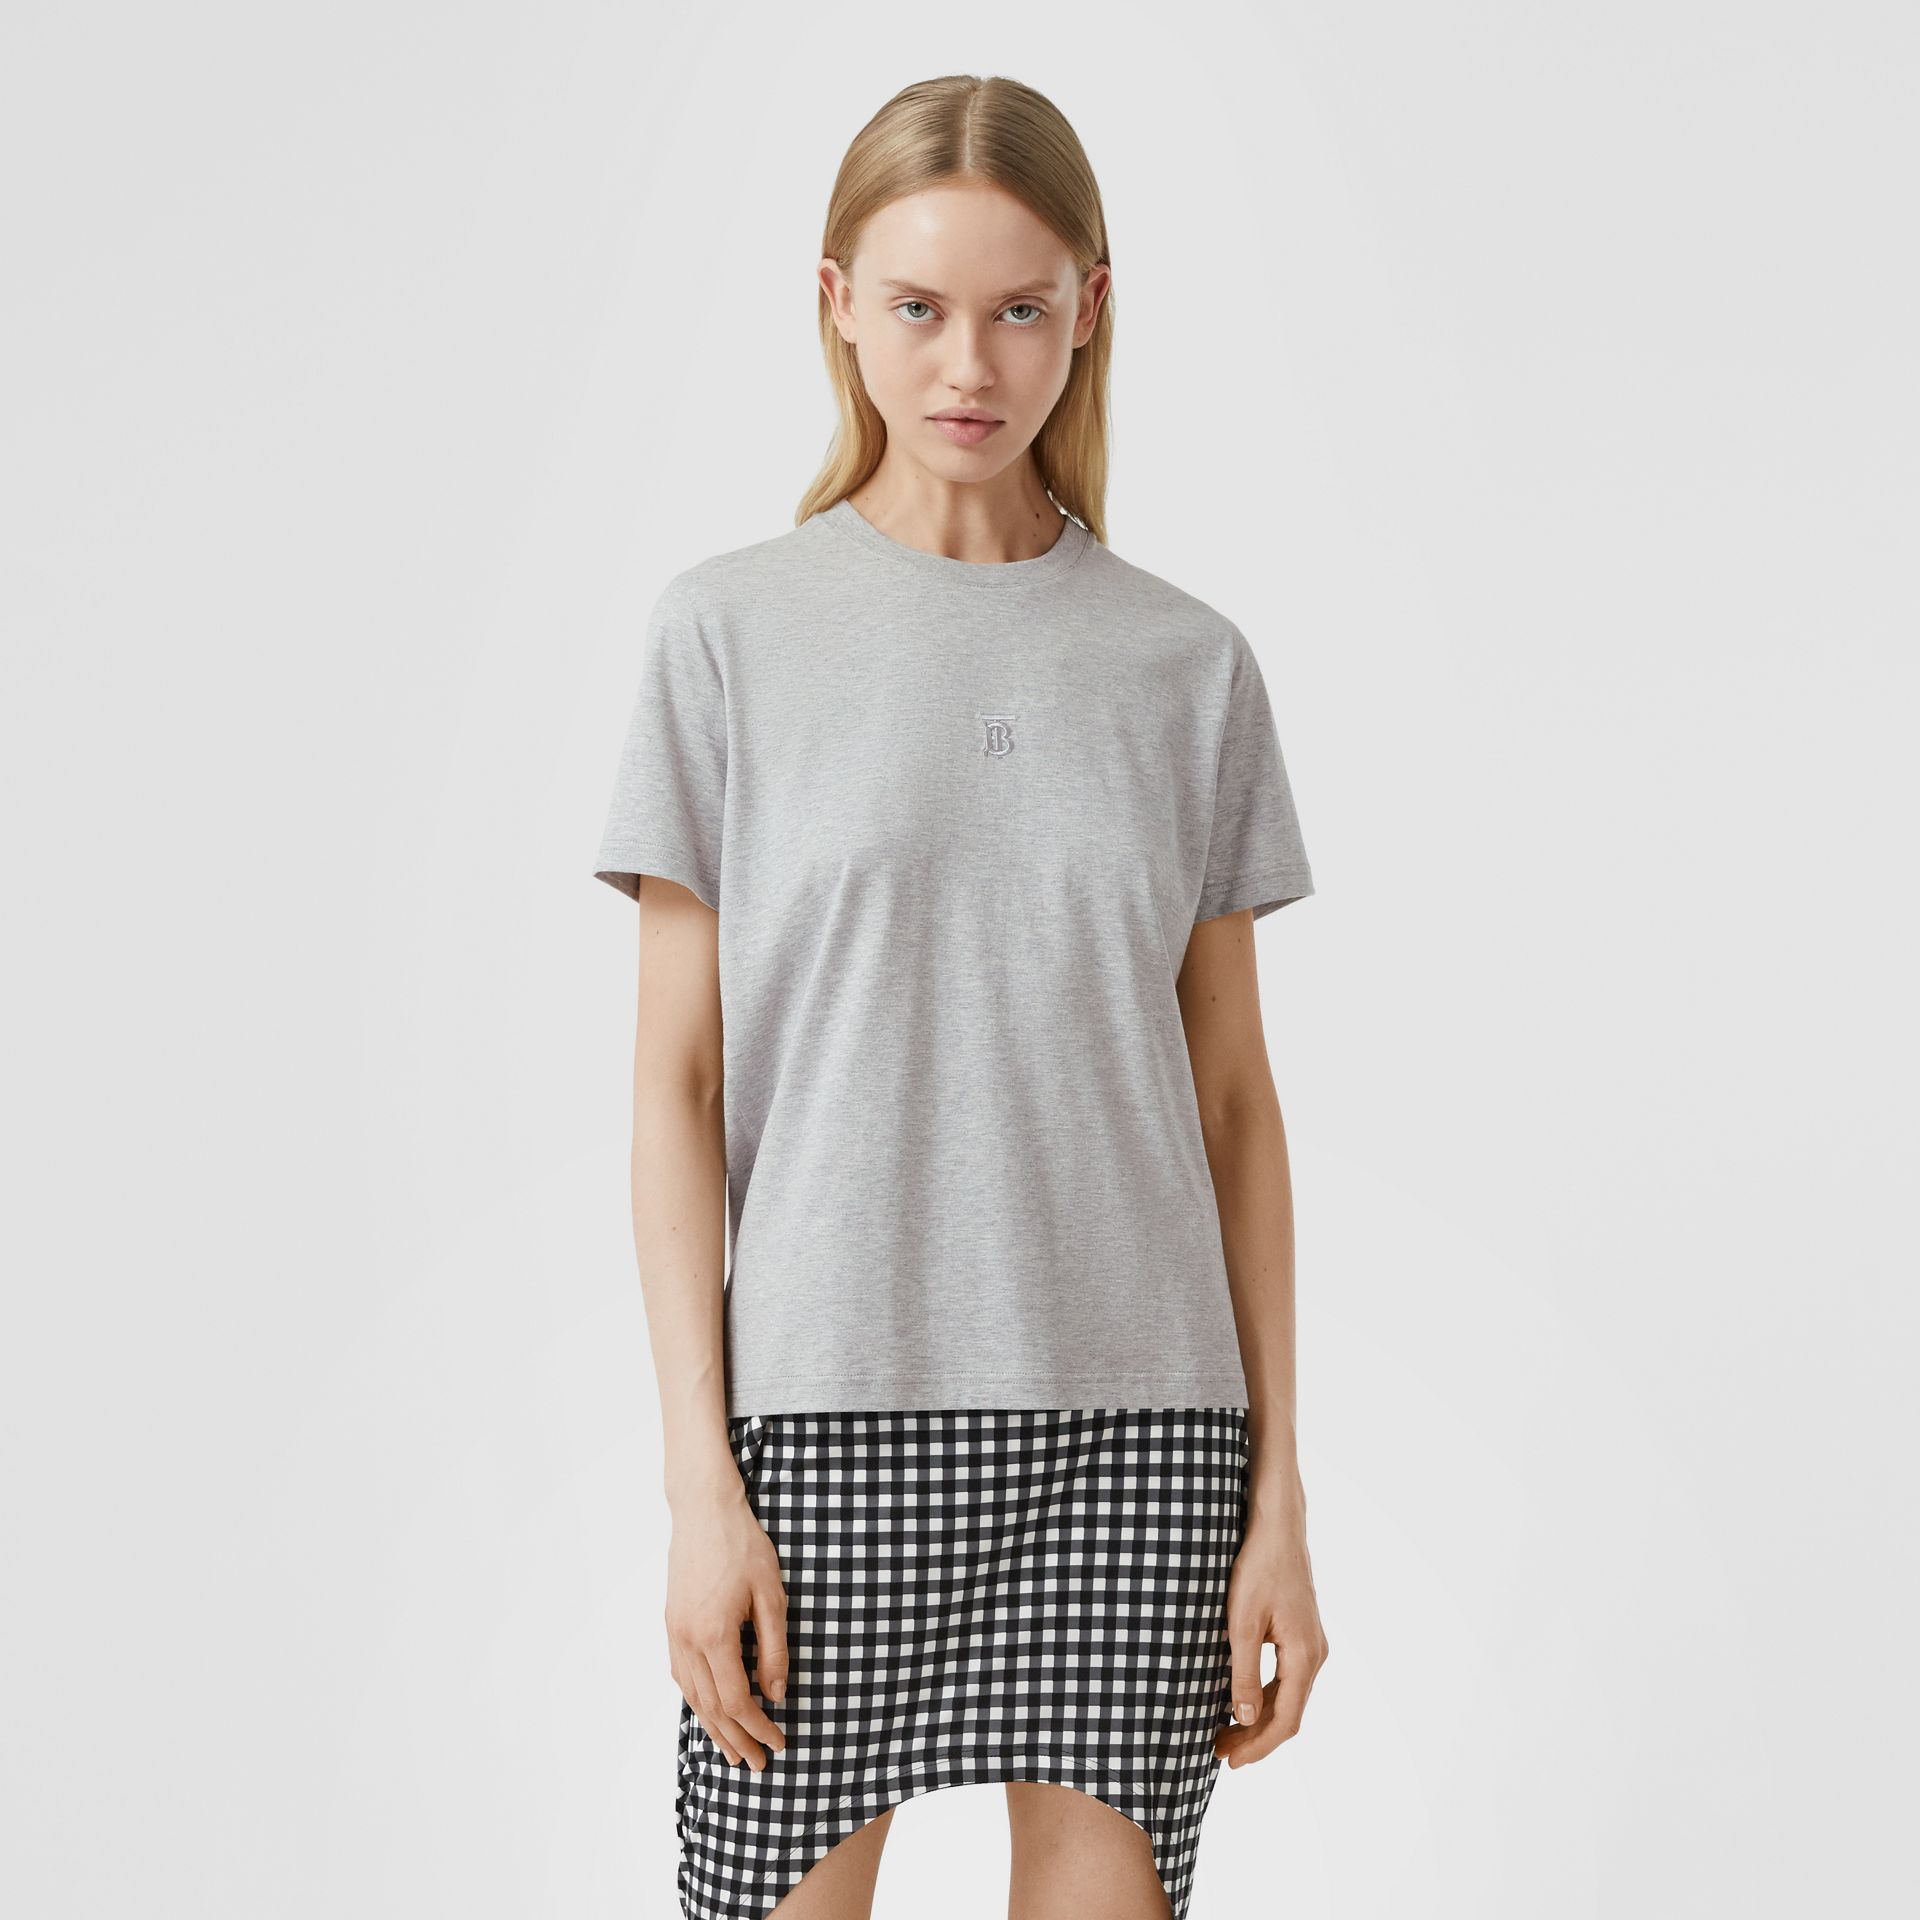 Monogram Motif Cotton T-shirt in Pale Grey Melange - Women | Burberry - gallery image 4